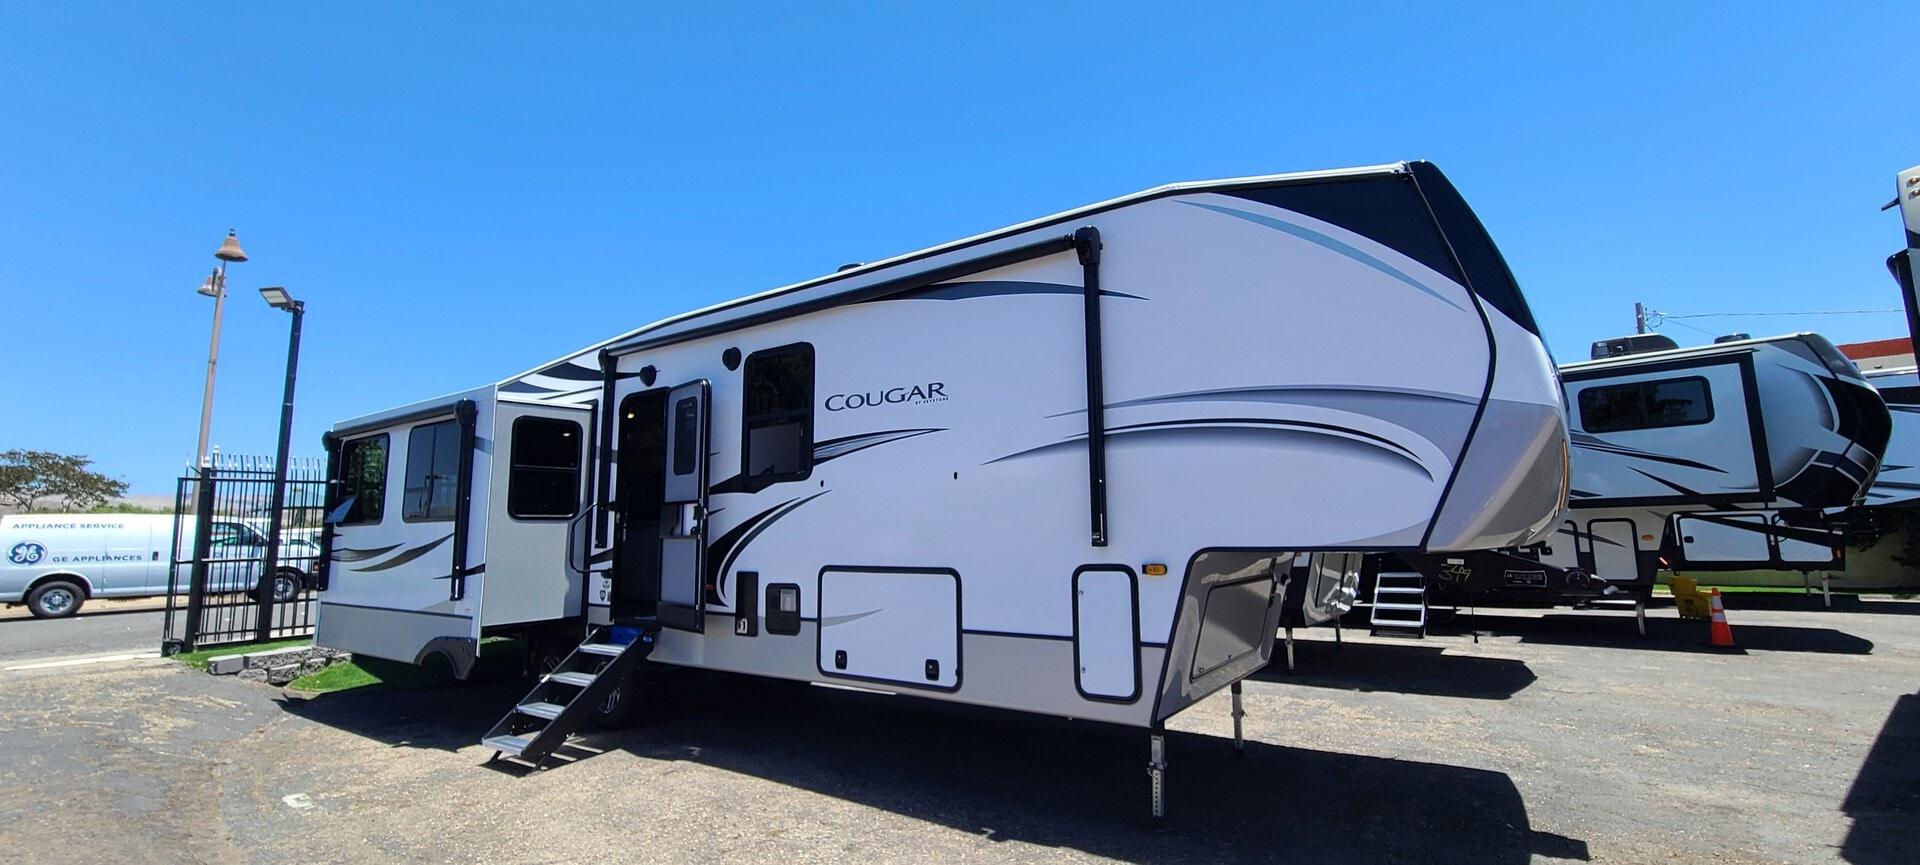 New, 2021, Cougar RV, 355FBS, Fifth Wheels